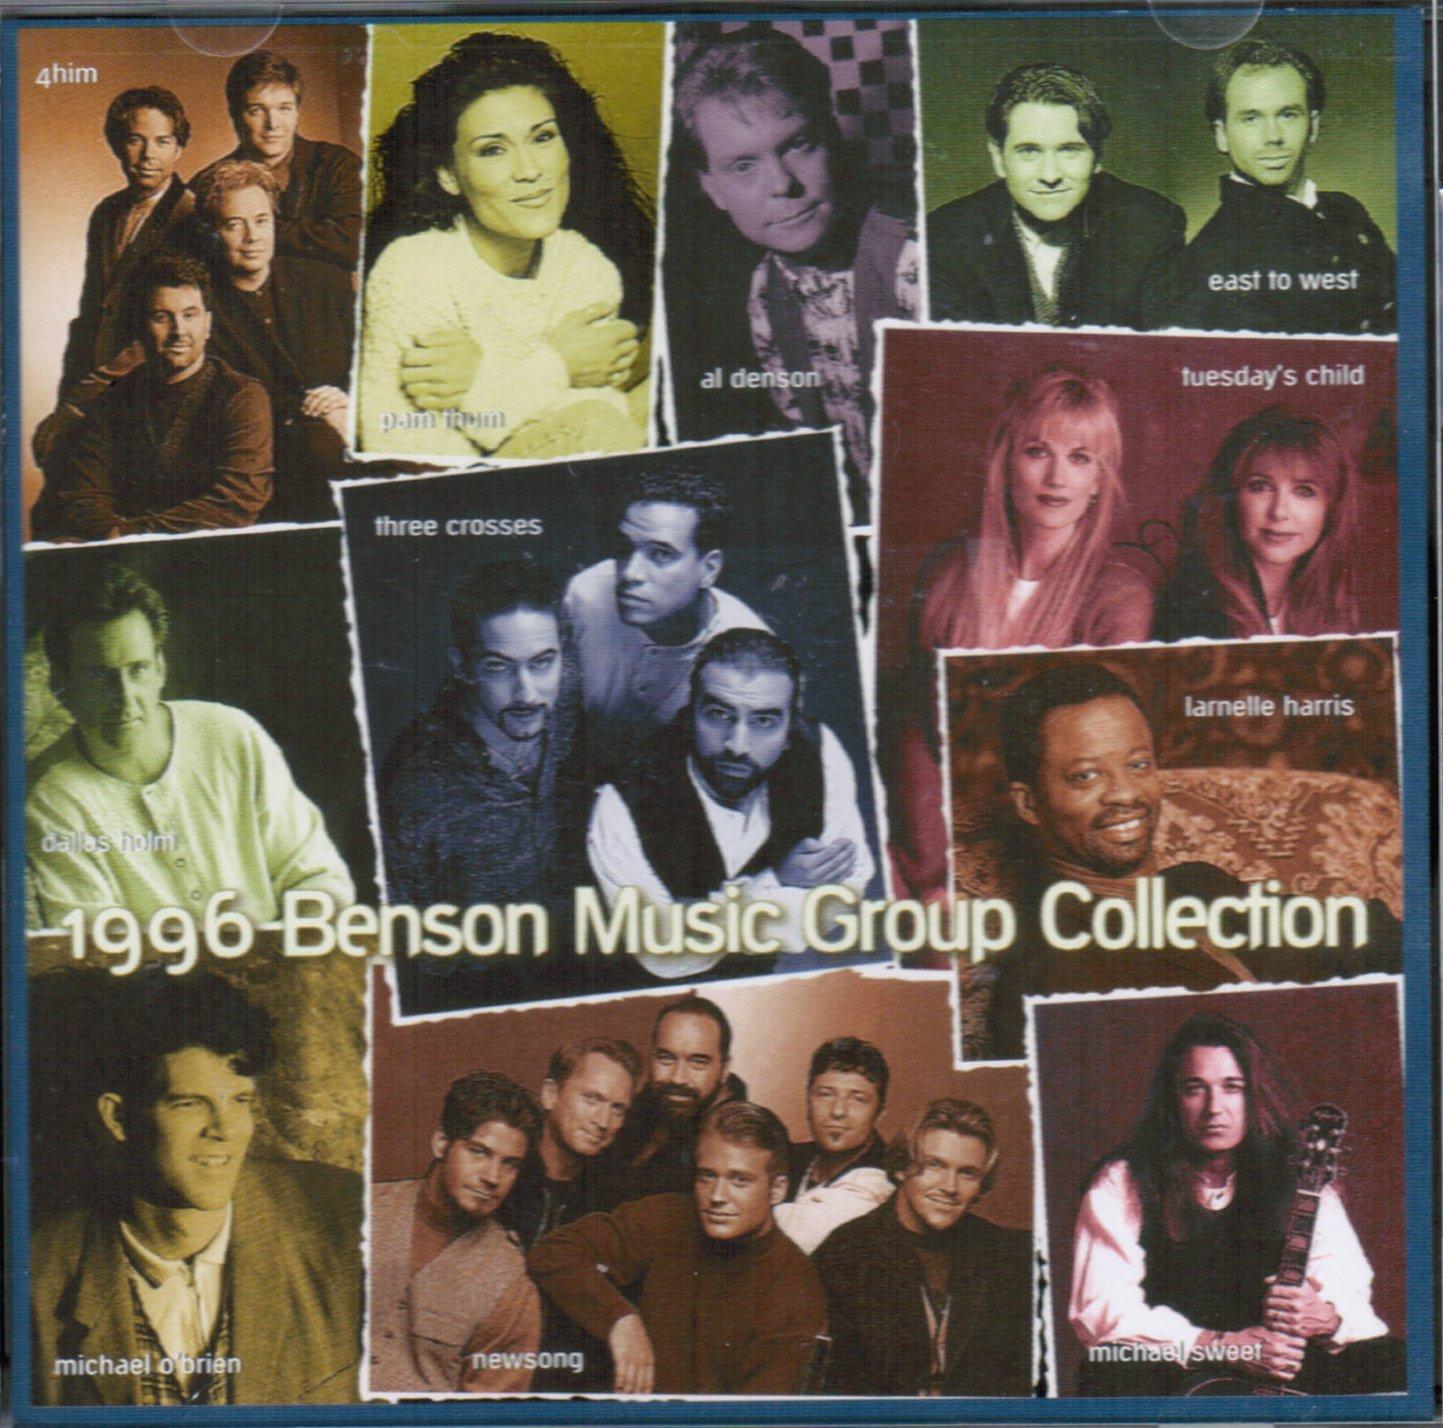 1996 Benson Music Group Collection